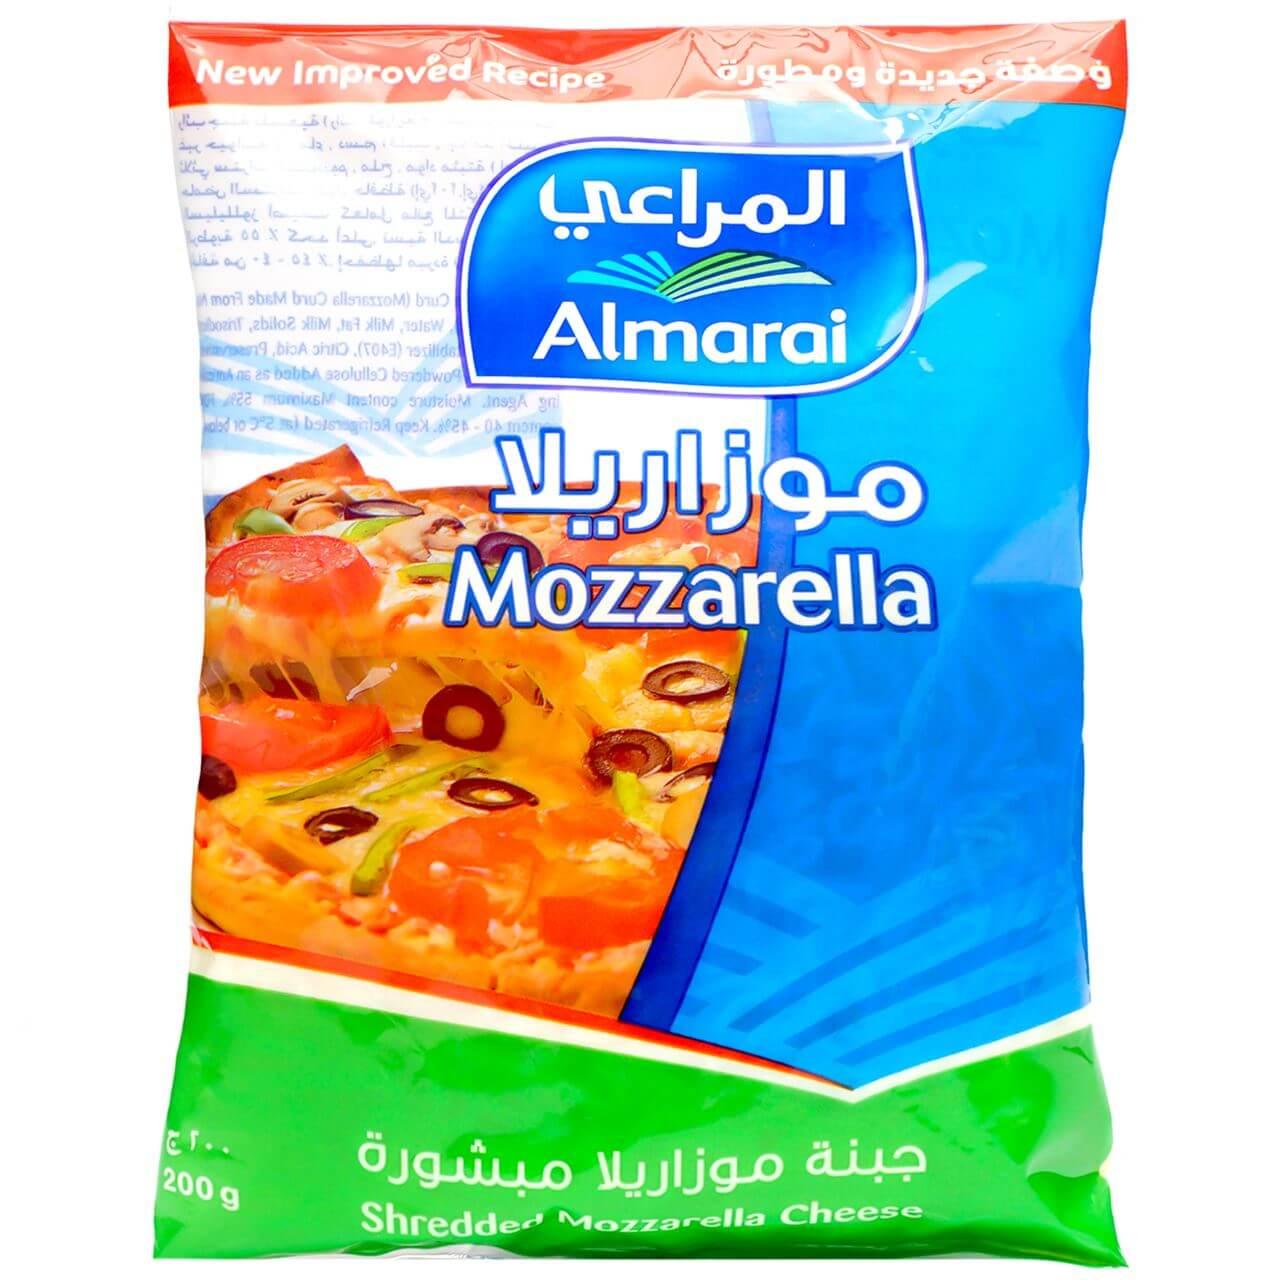 Al Marai Shredded Mozzarella Cheese